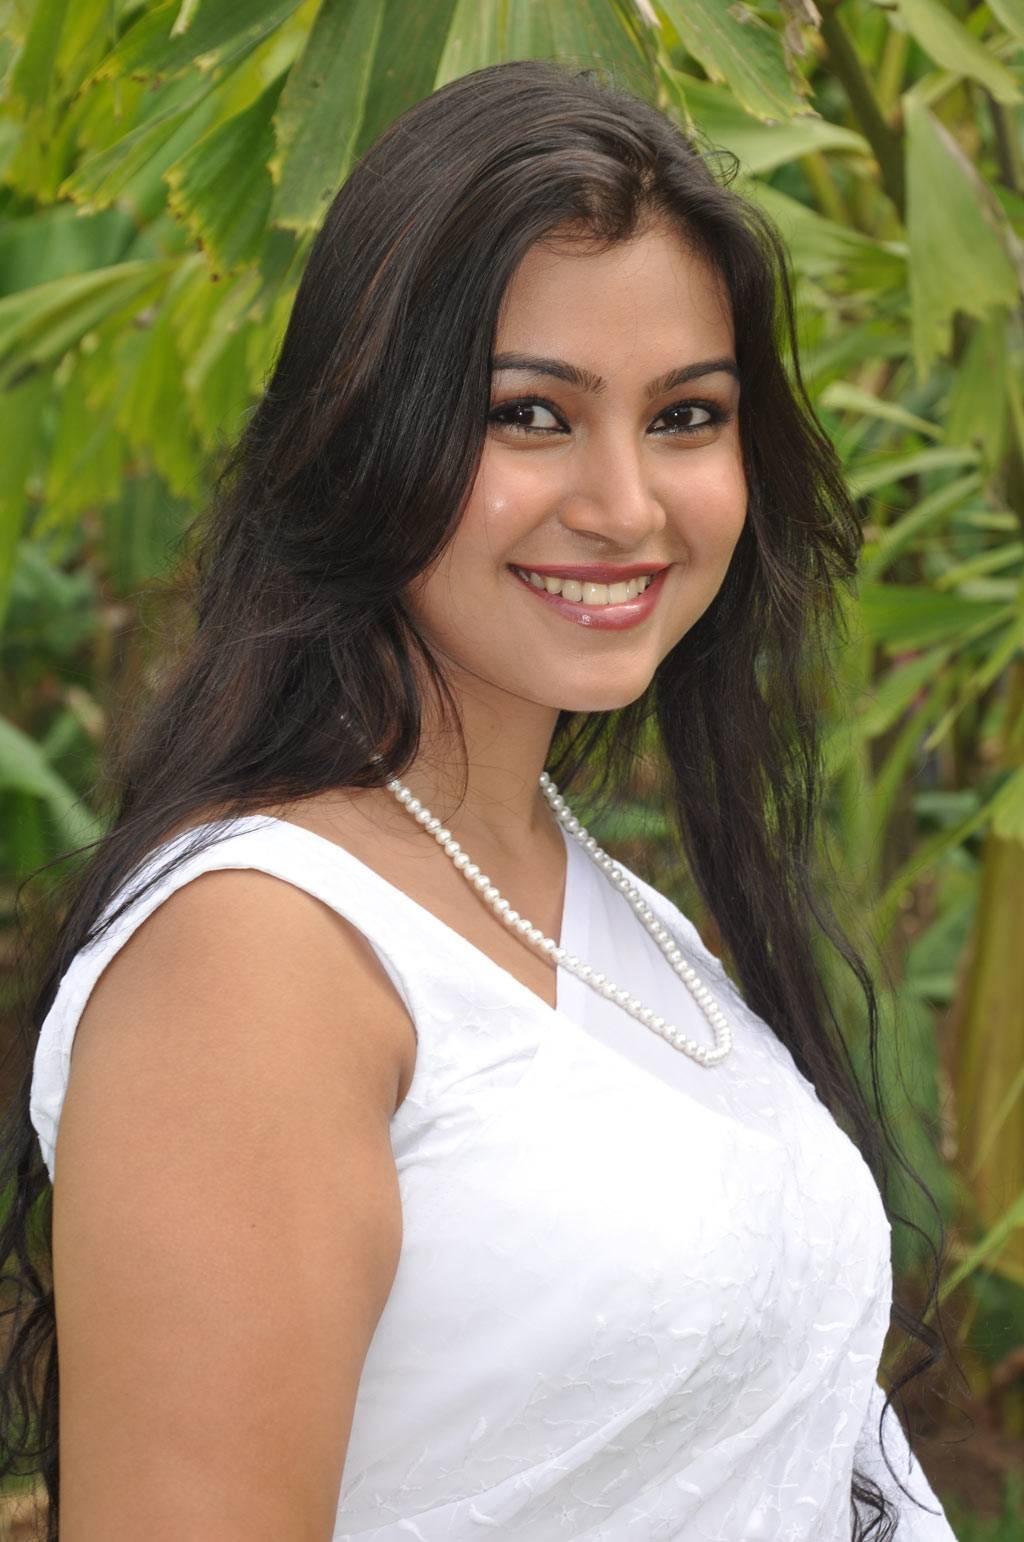 tamil actress varsha pandey saree navel blouse latest cleavages stills actresses telugu movie below cleavage sleeveless indian movies